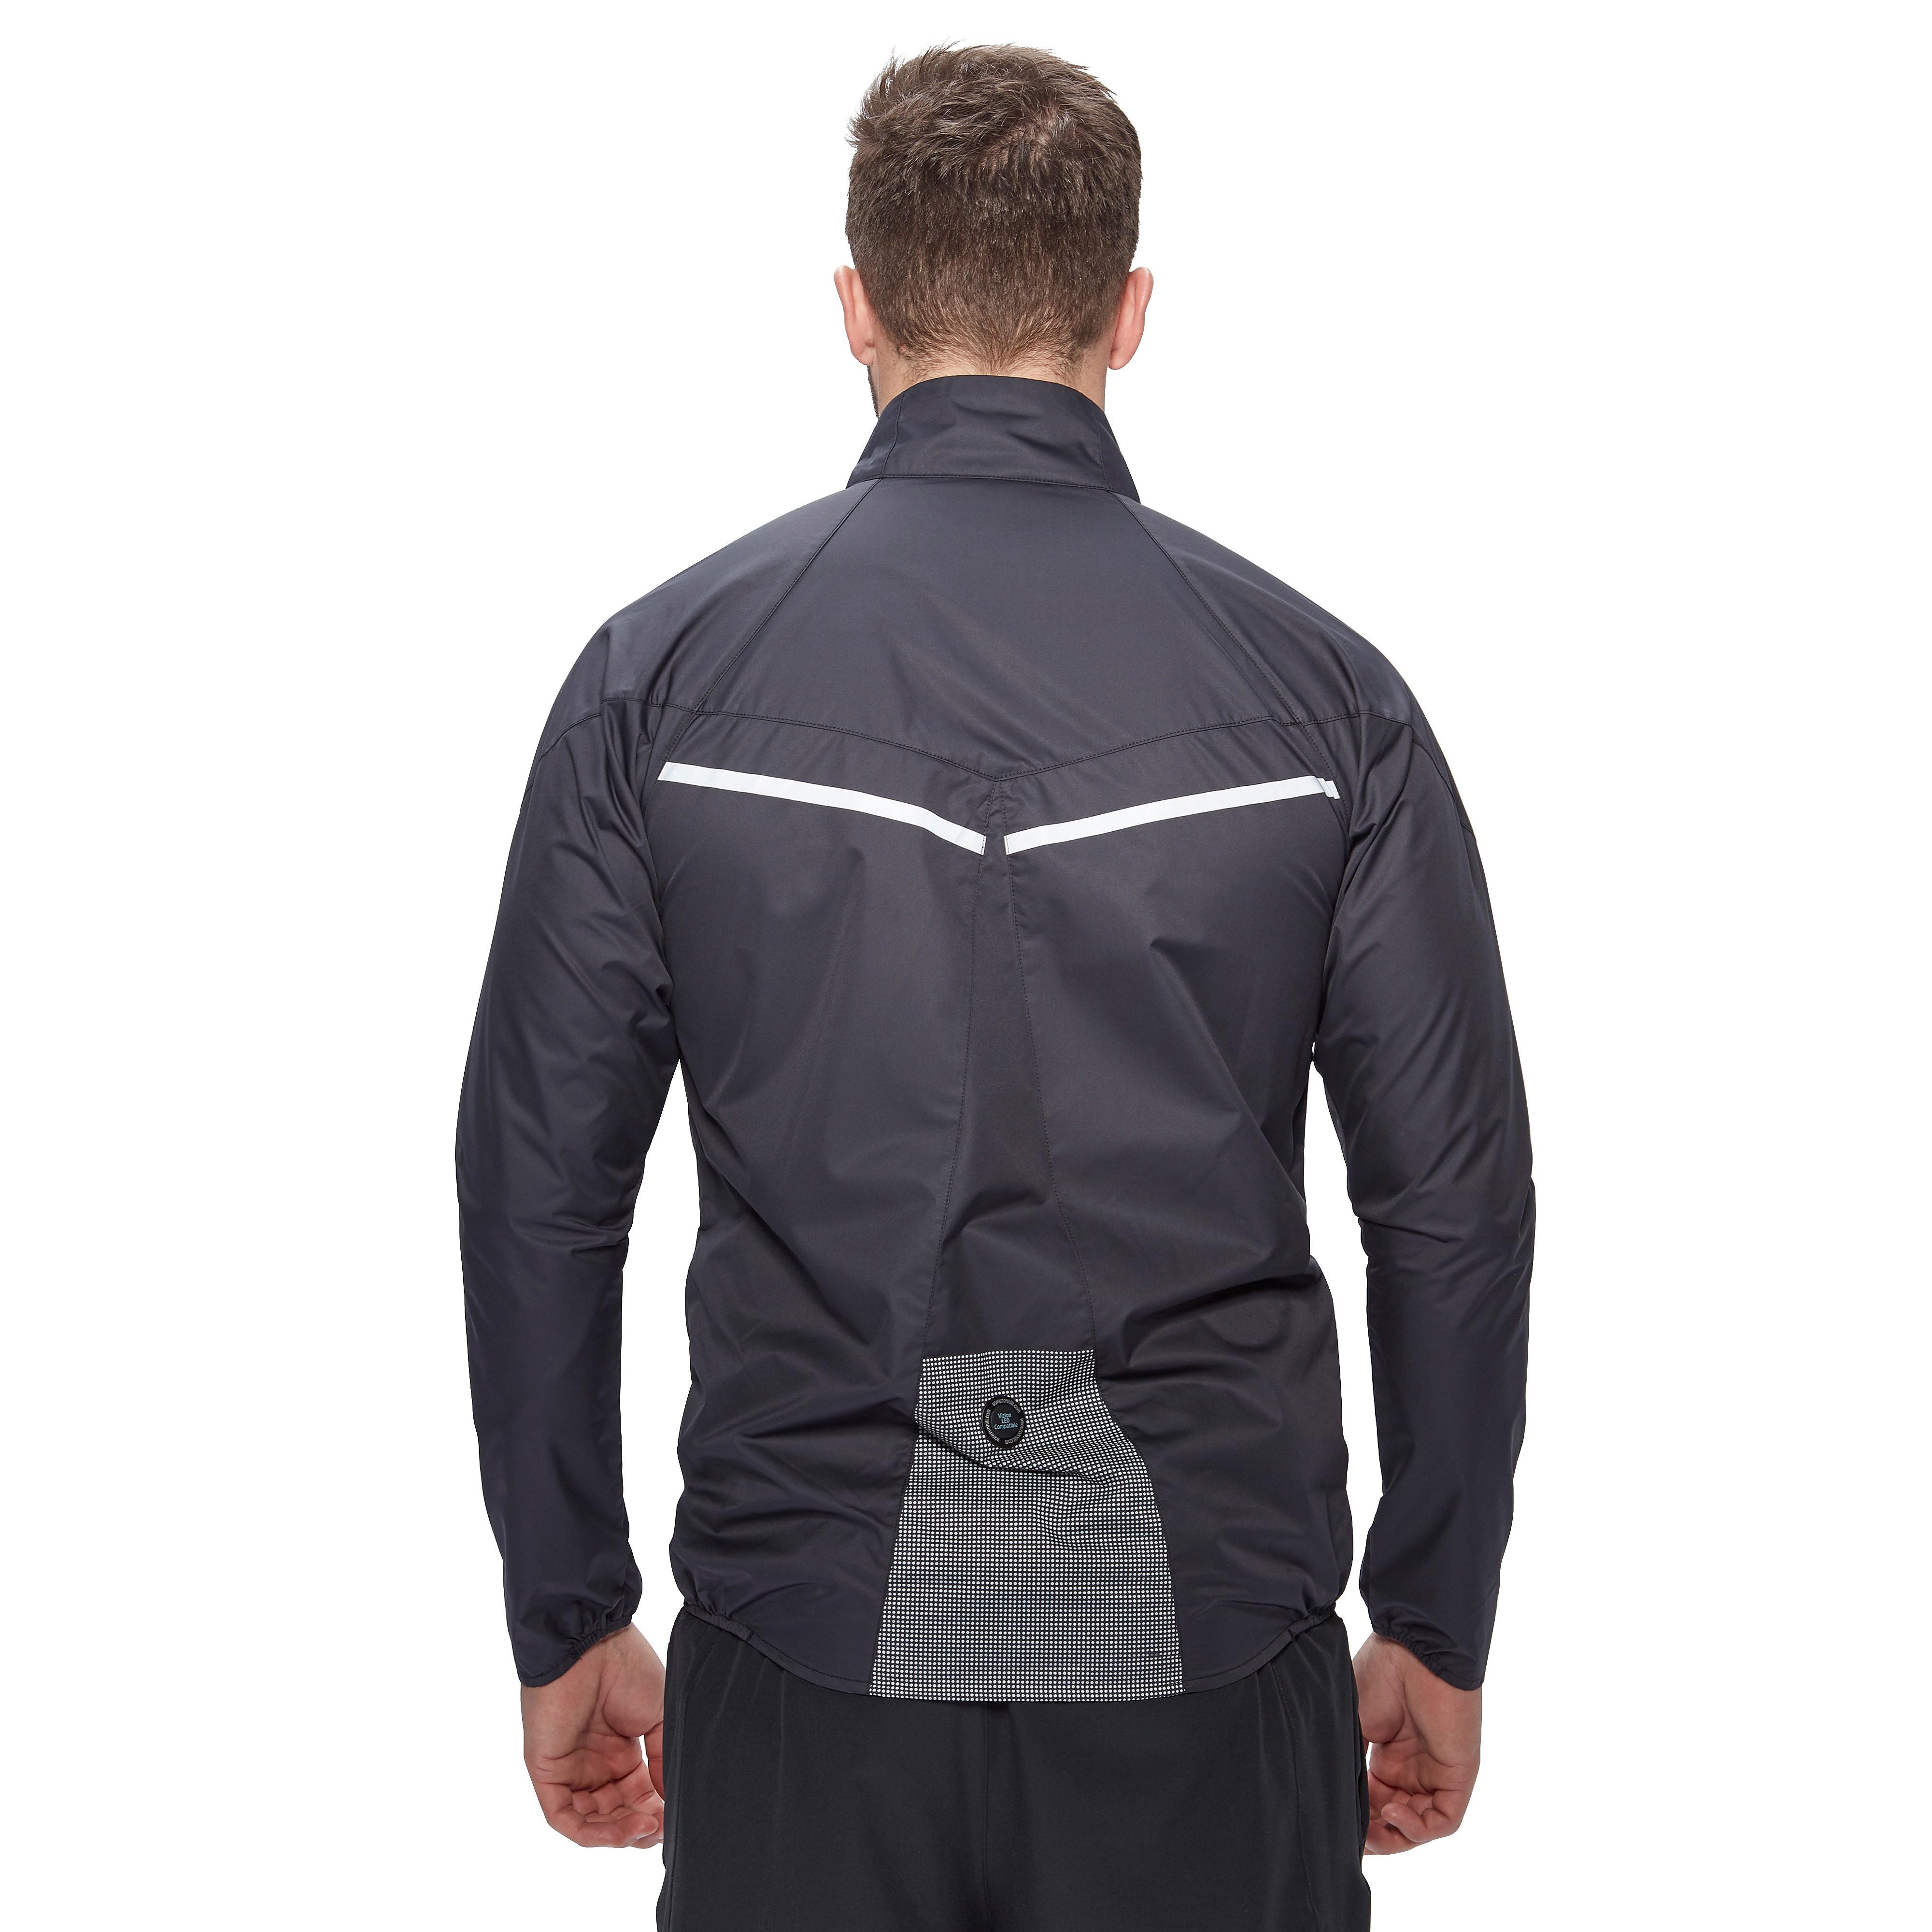 Ronhill Vizion Radiance Men's Jacket